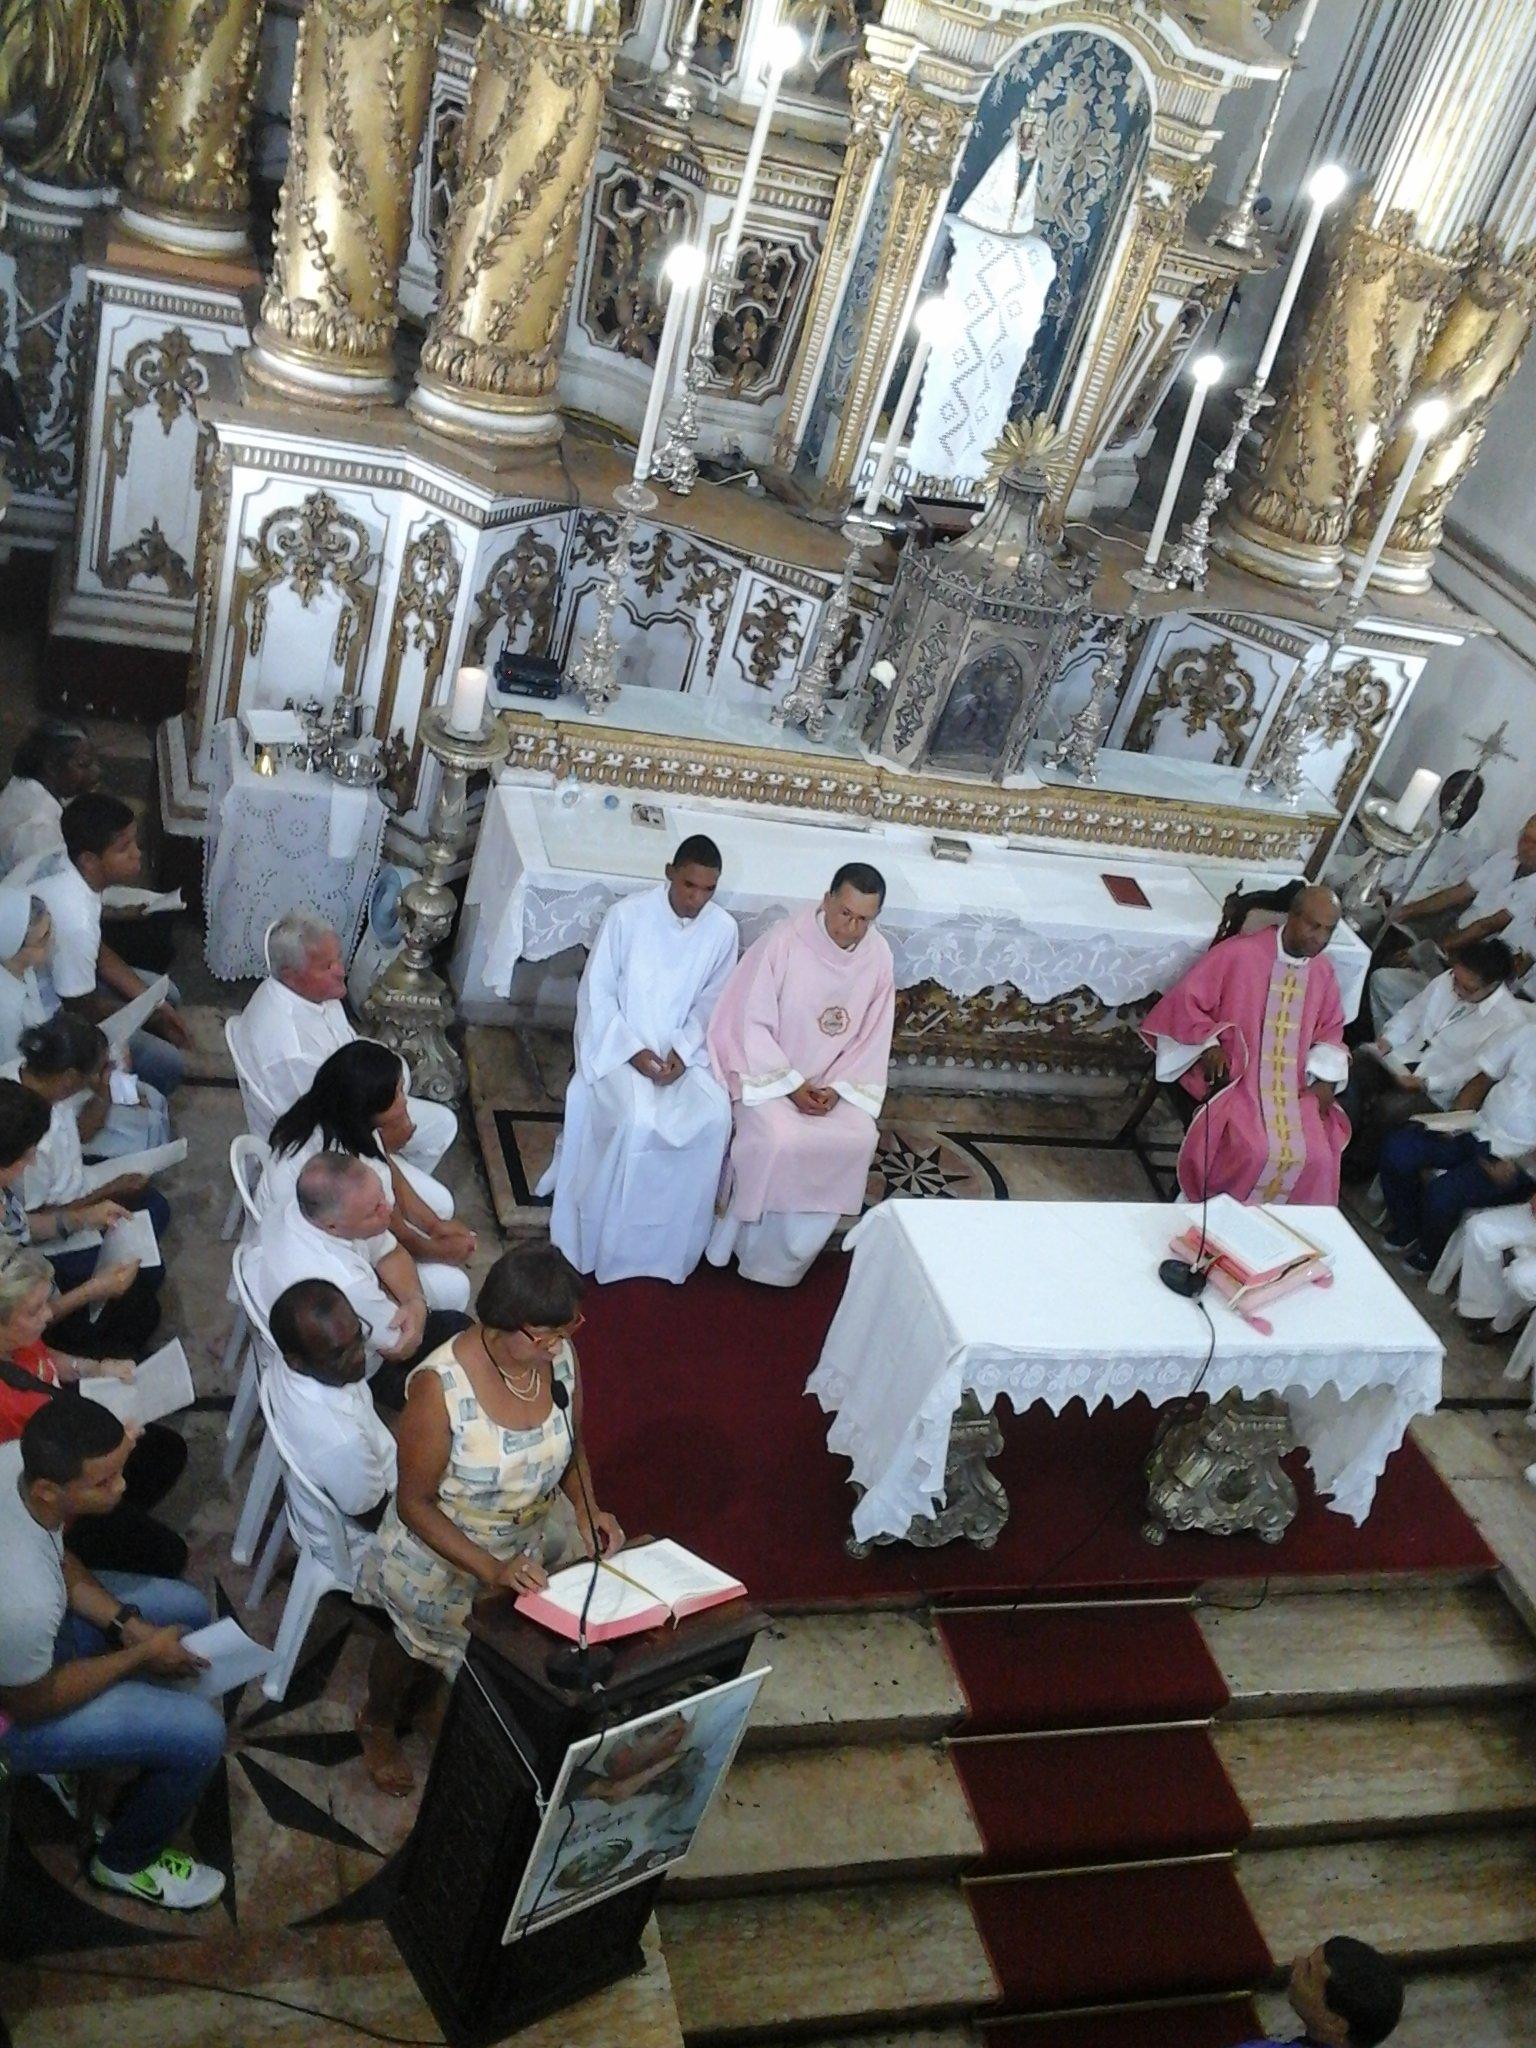 Novos Ministros da Eucaristia da Basílica